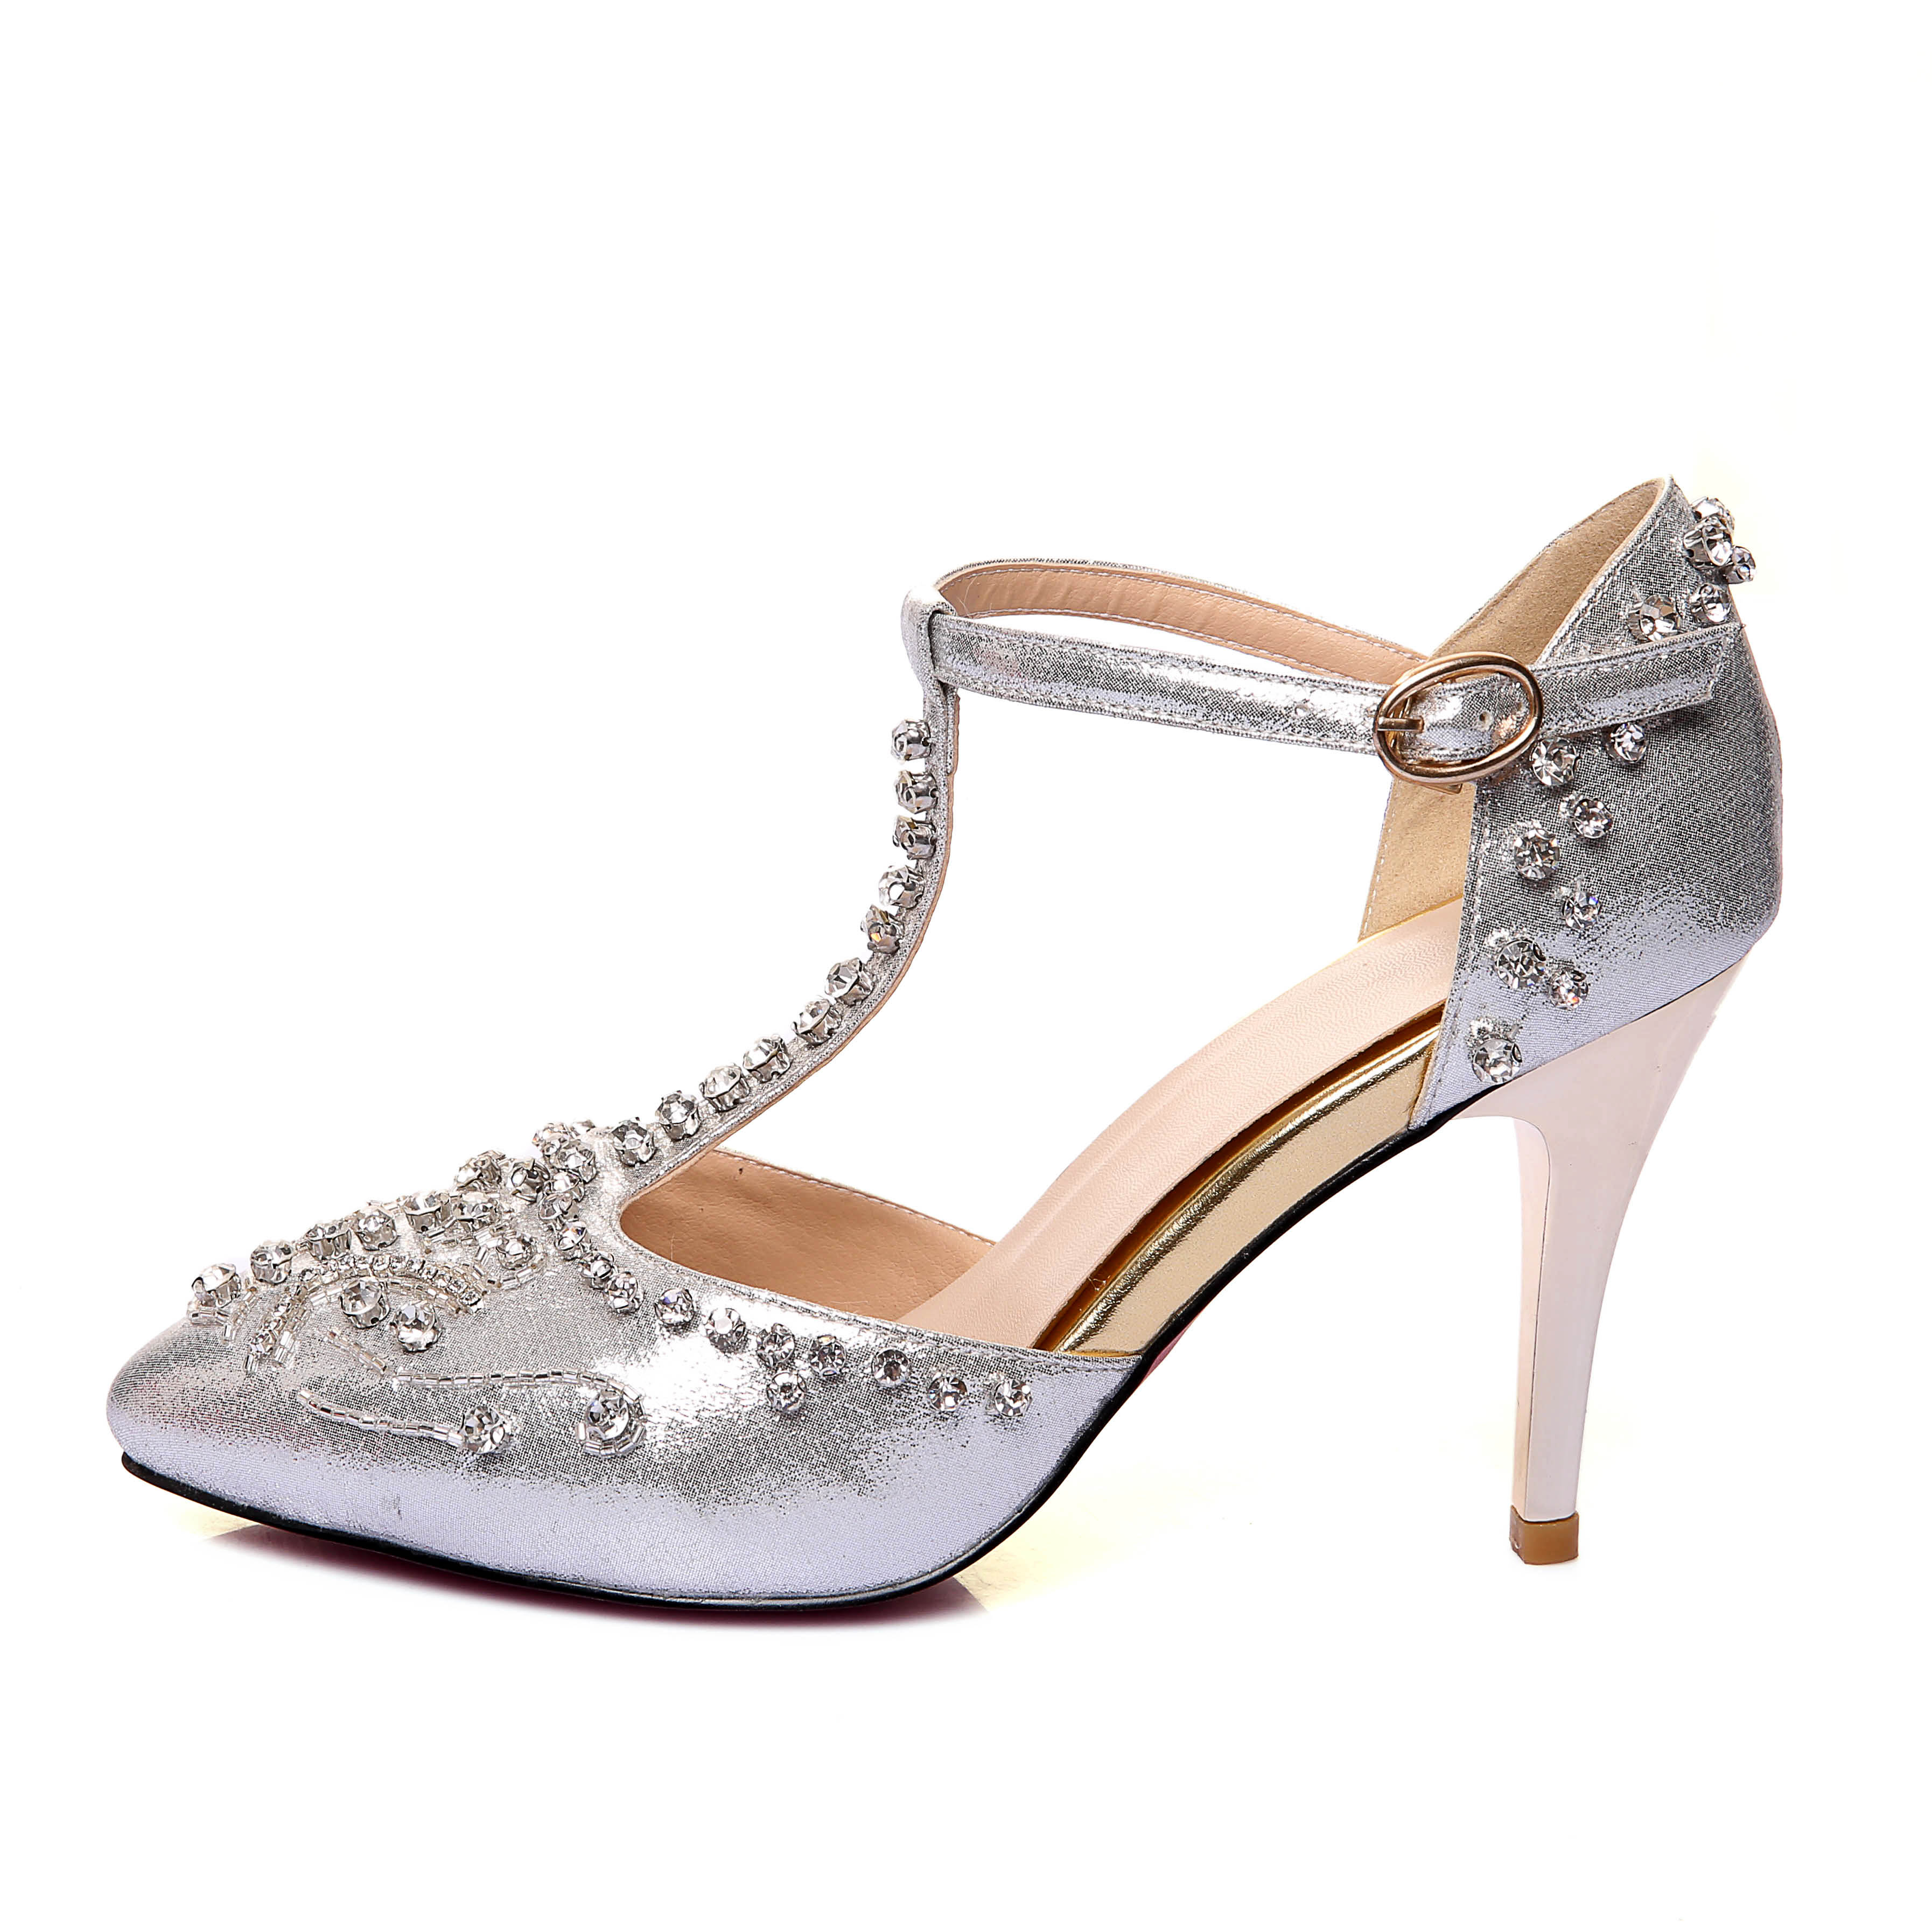 cde01dd7d US  49 - Arden Furtado 2018 spring summer silver red crystal flowers high  heels 9cm stilettos closed toe T-strap sandals wedding shoes -  www.ardenfurtado. ...